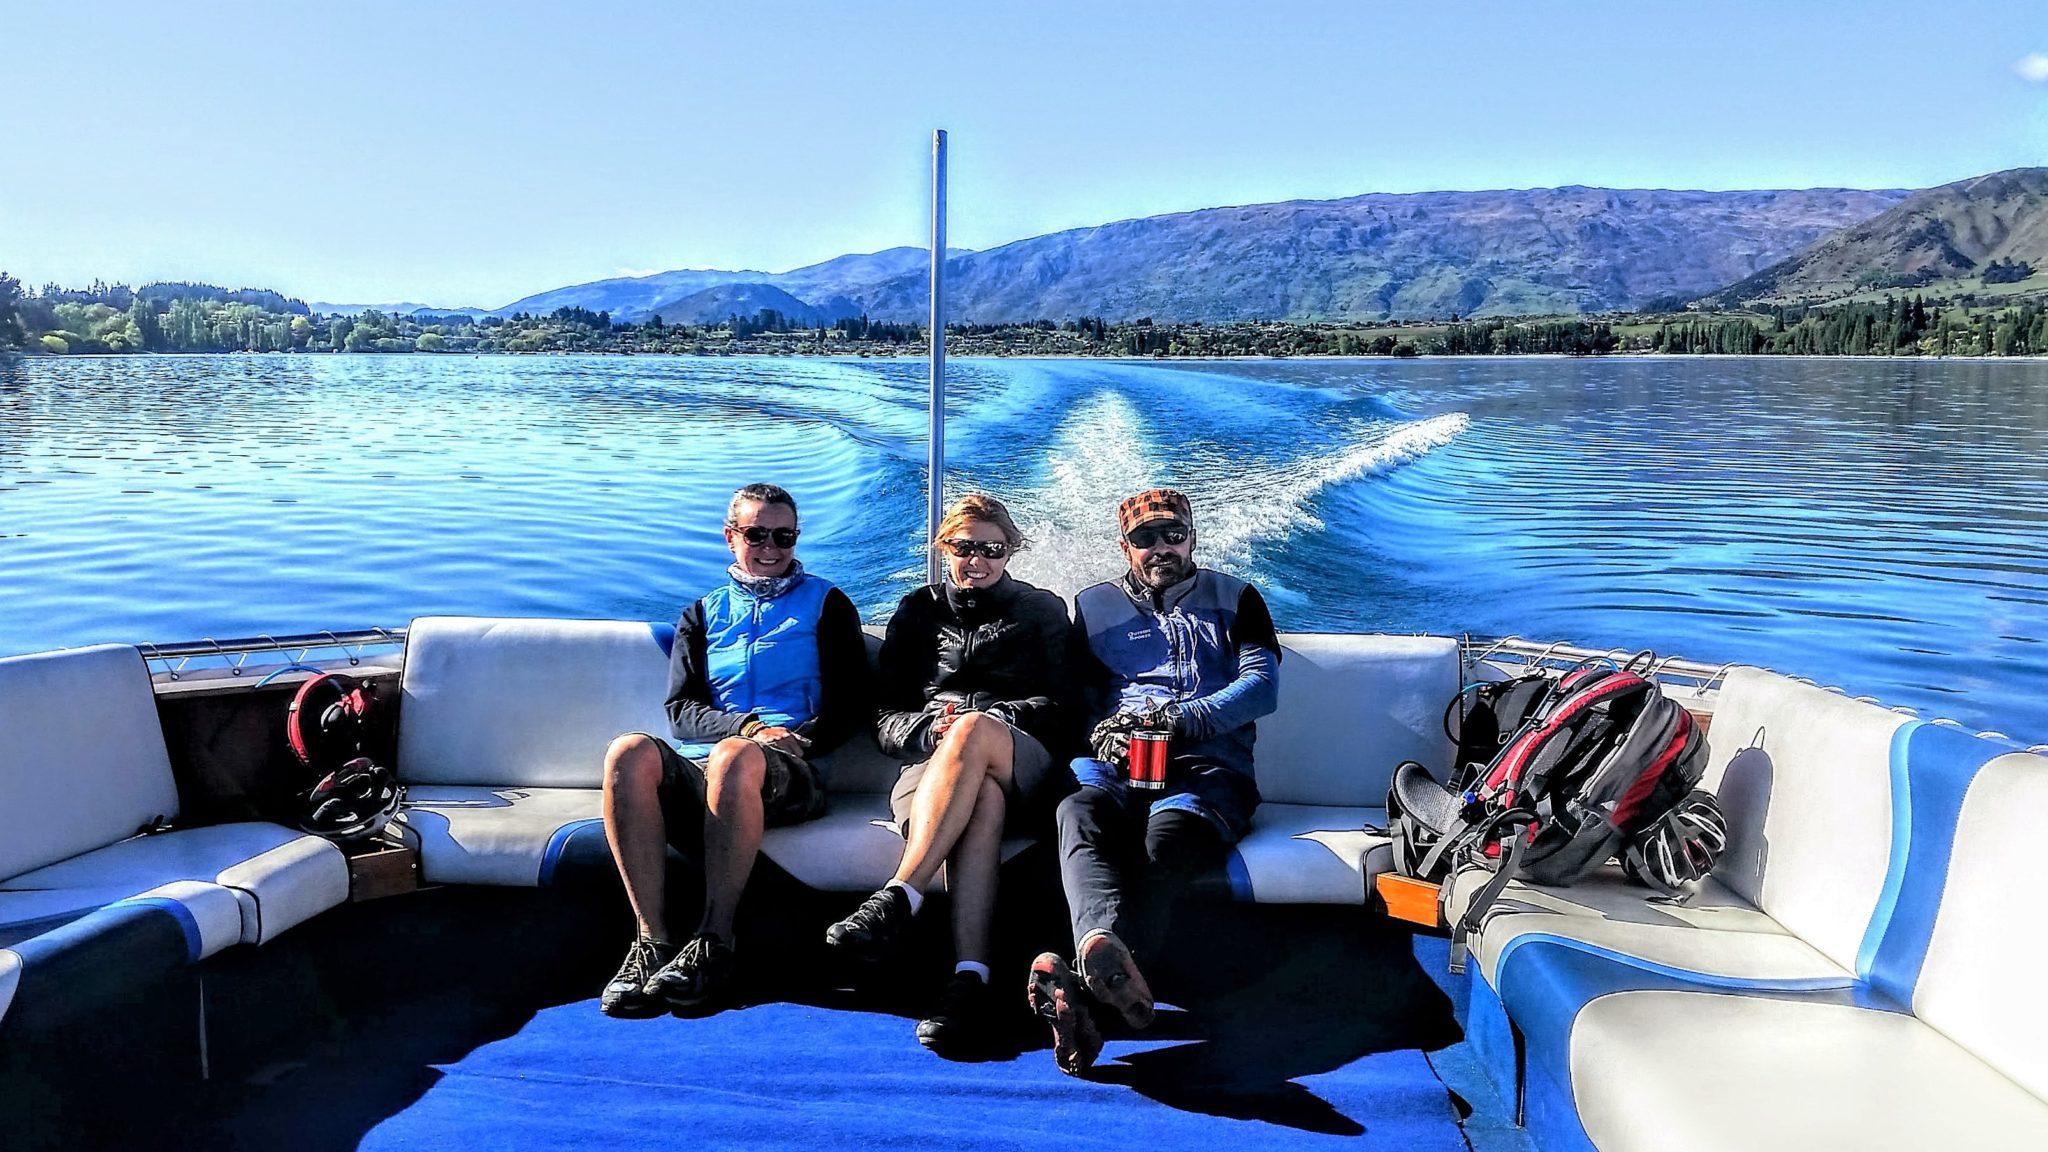 Discover Wanaka by boat